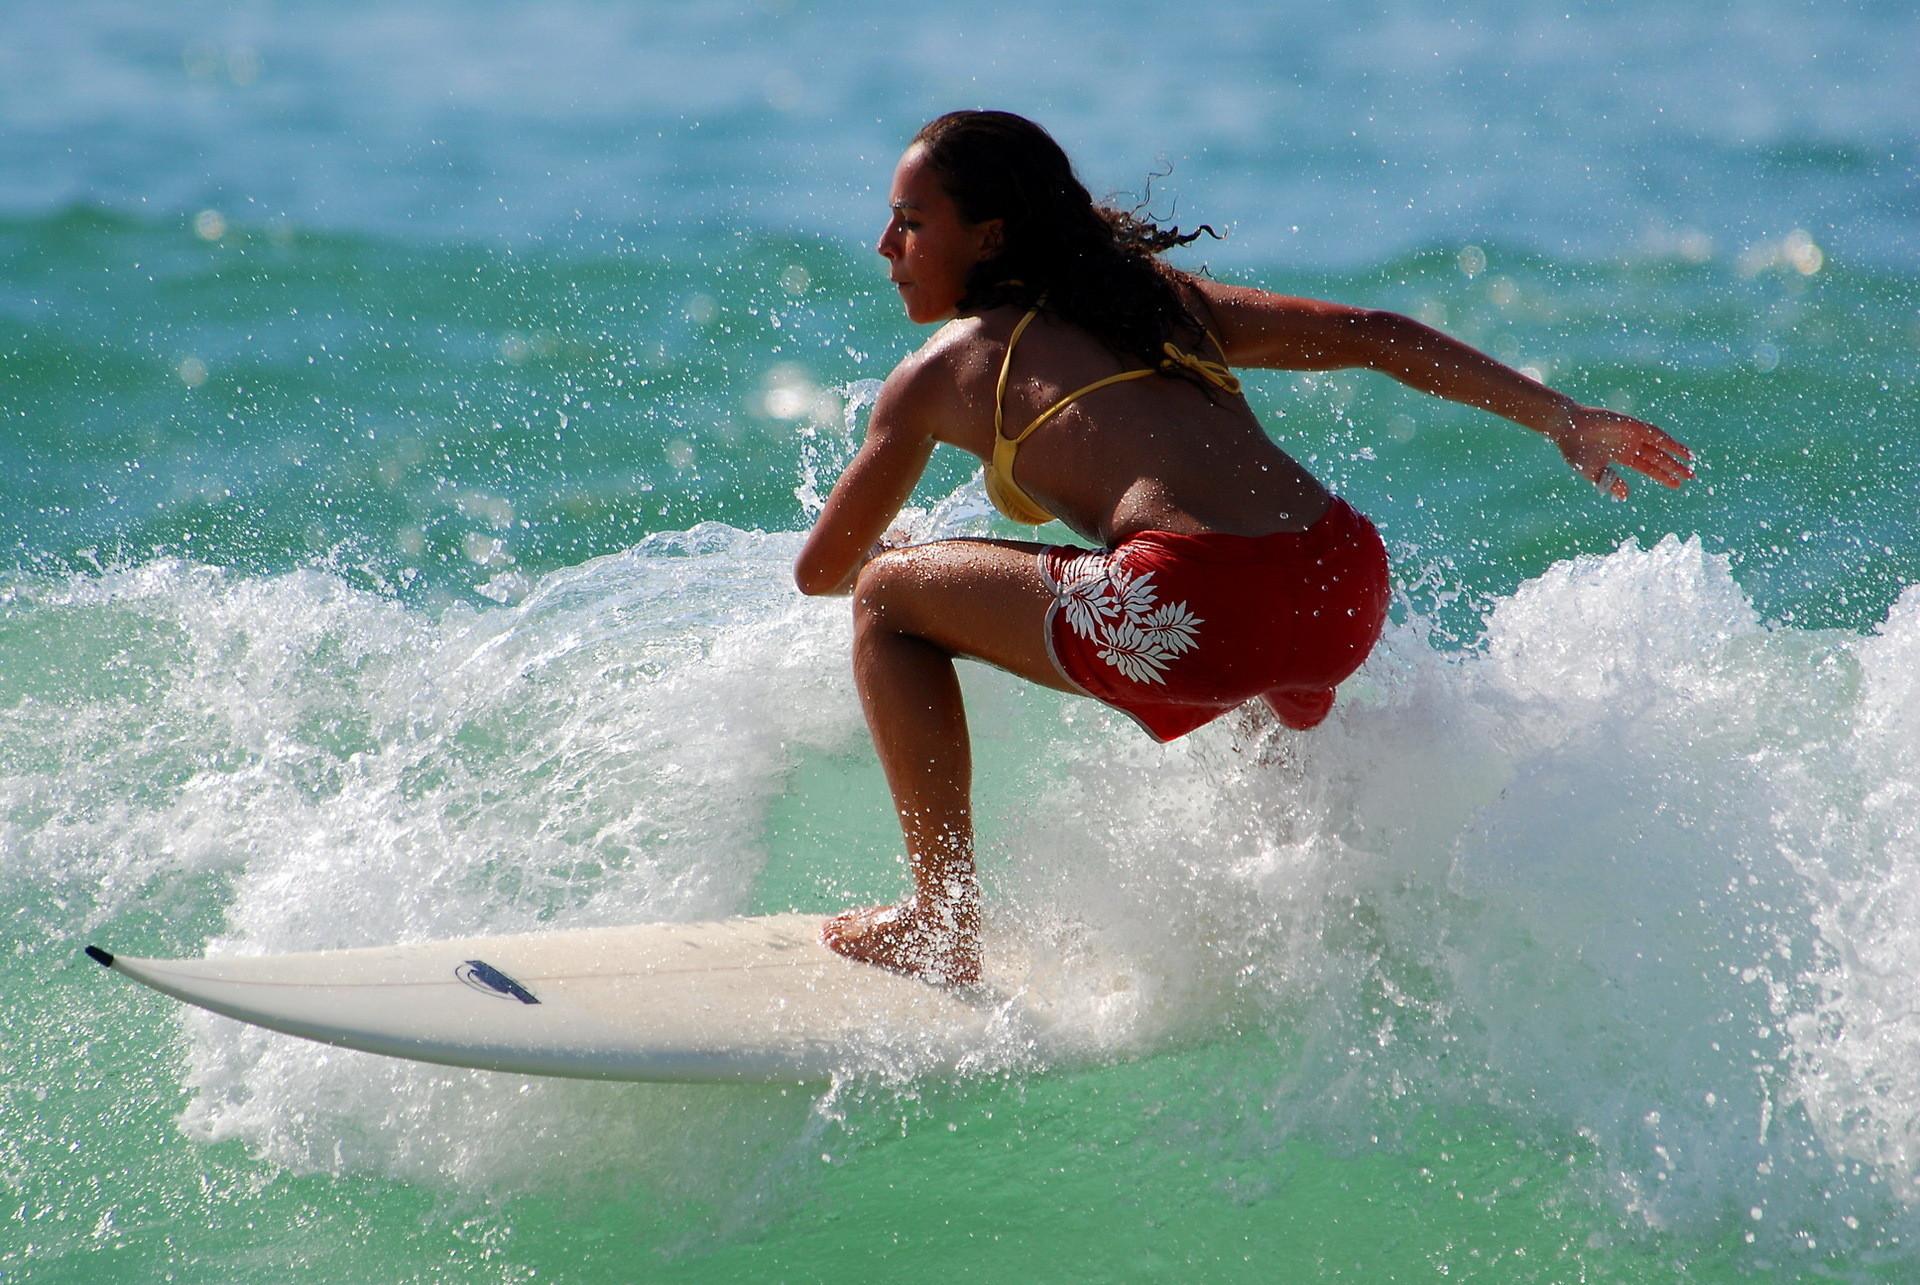 Surfer Girl Wallpaper   … girl hd desktop Sunset Surfer Girl  Sexy Waves